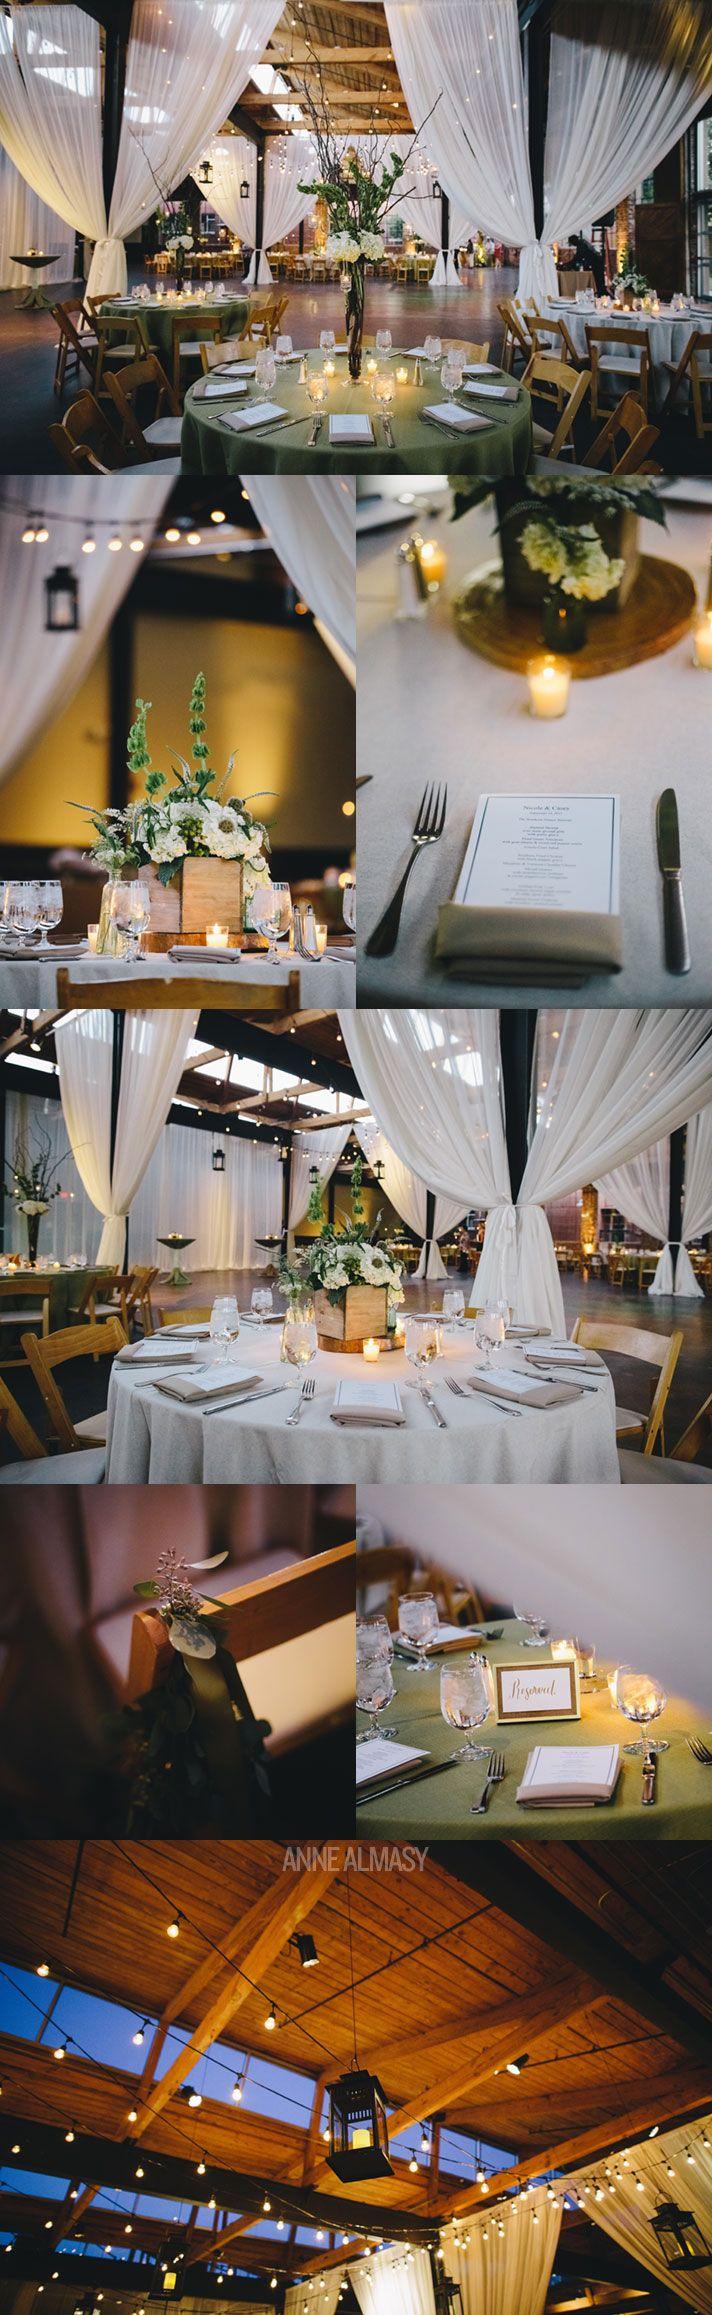 Industrial loftstyle wedding decor by bold american casey